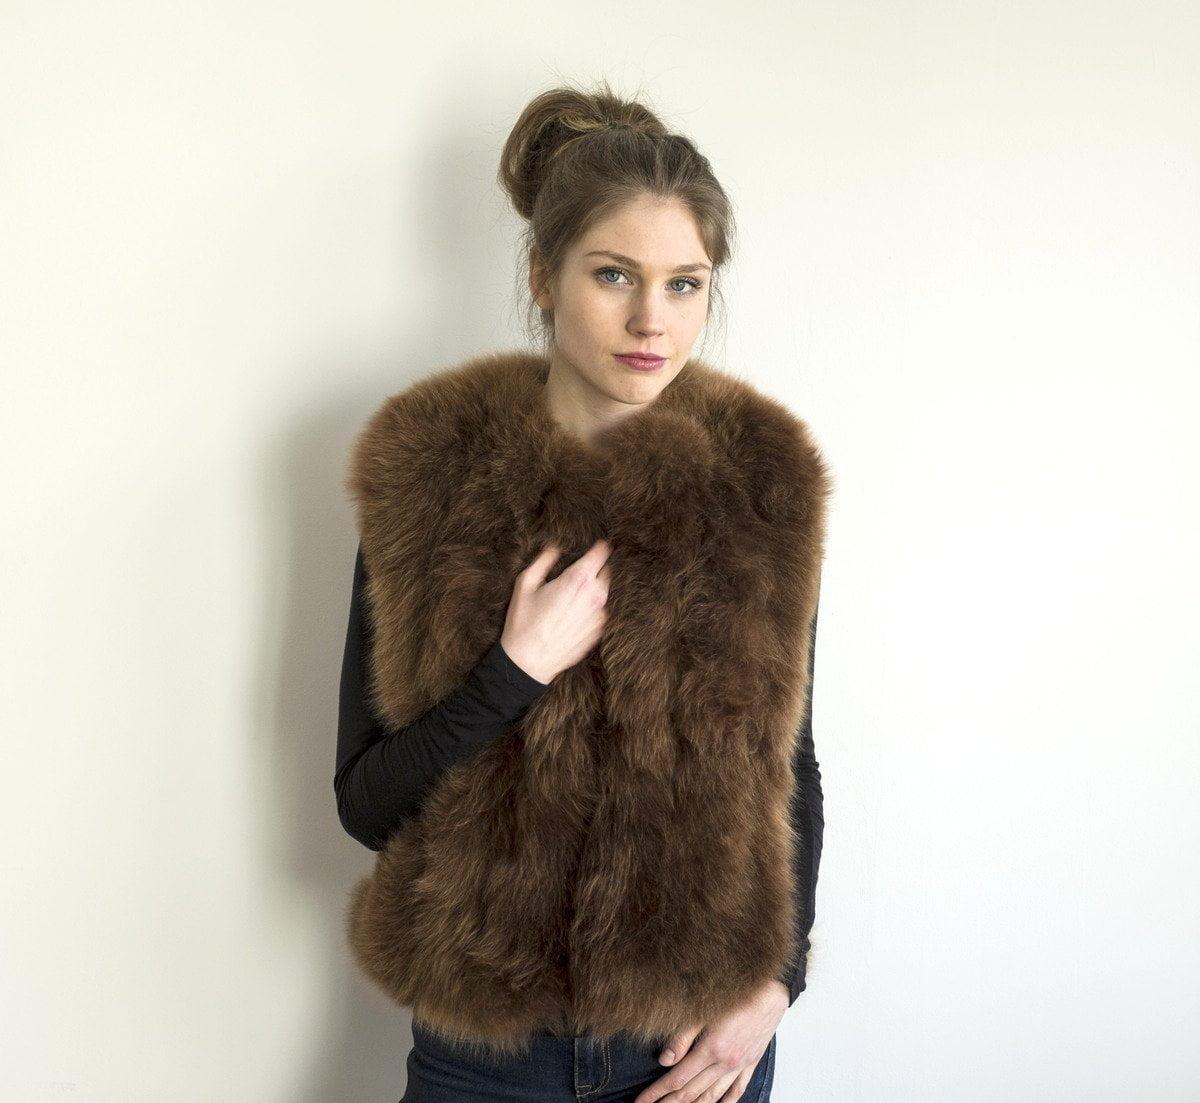 Watch - Fur wear how to gilets video